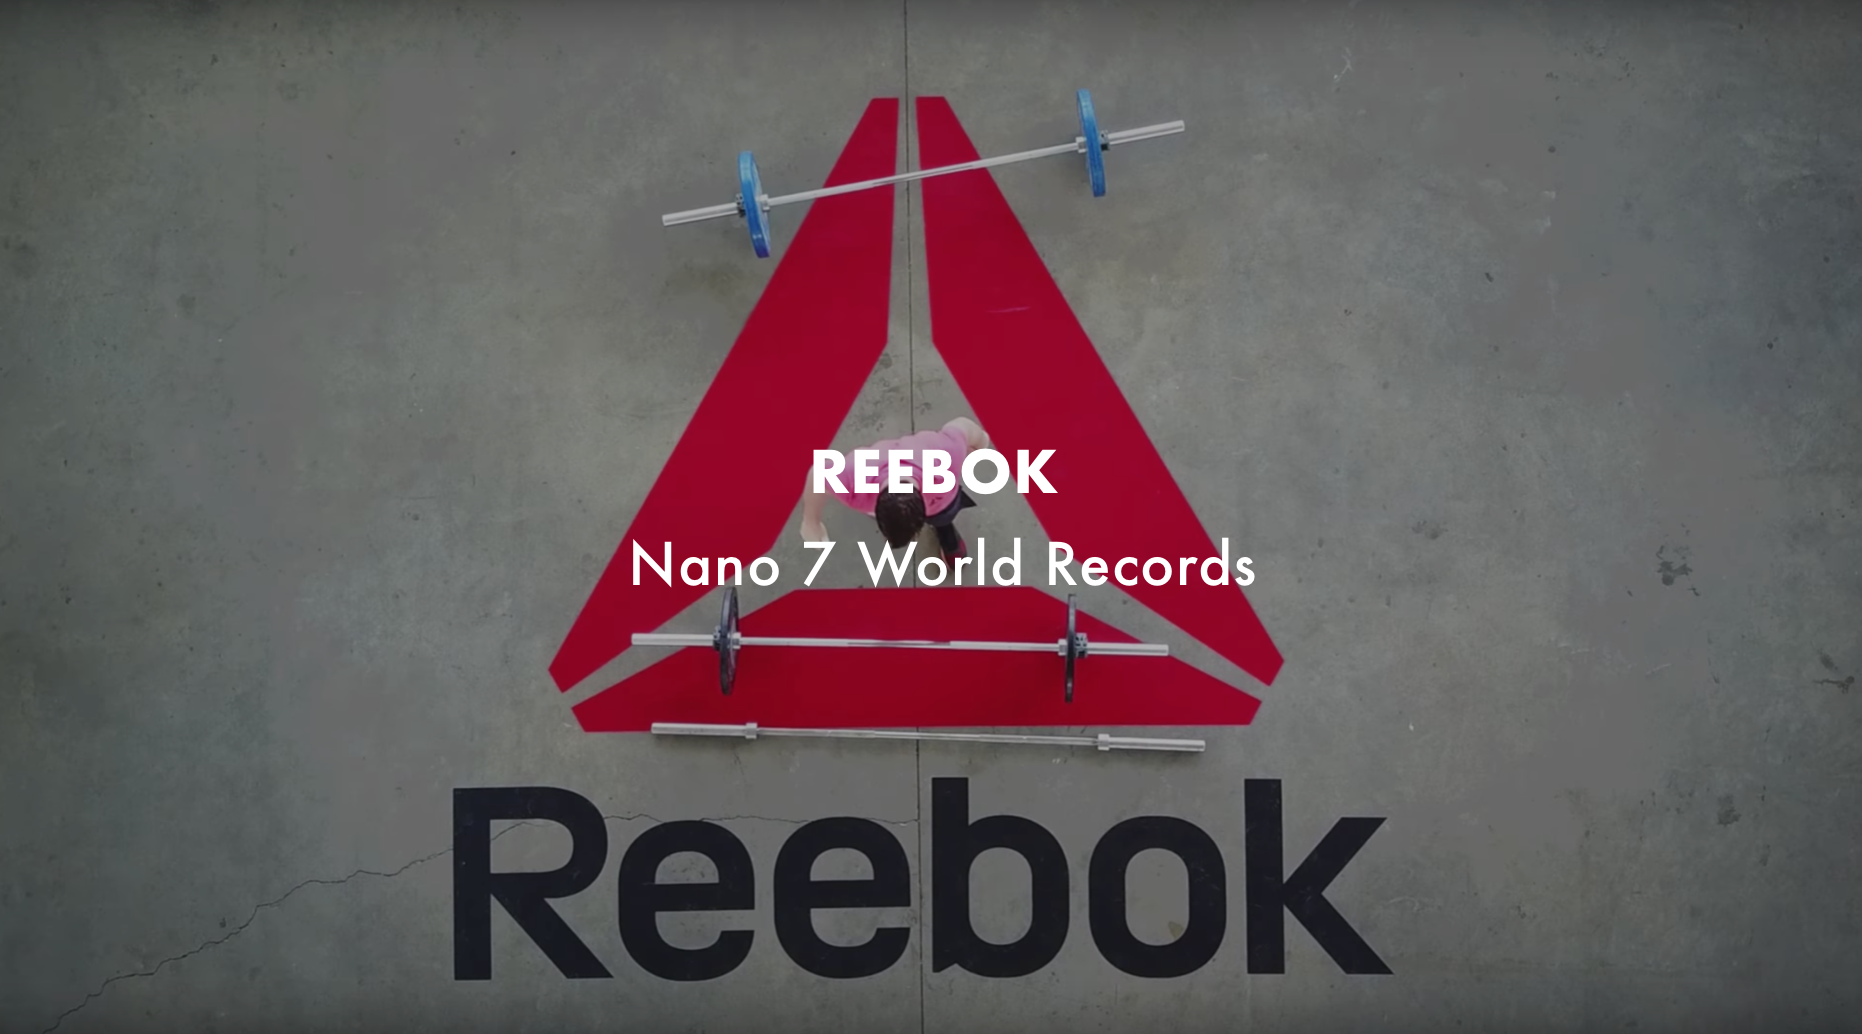 Reebok -  CrossFit Nano 7 Powers New World Records